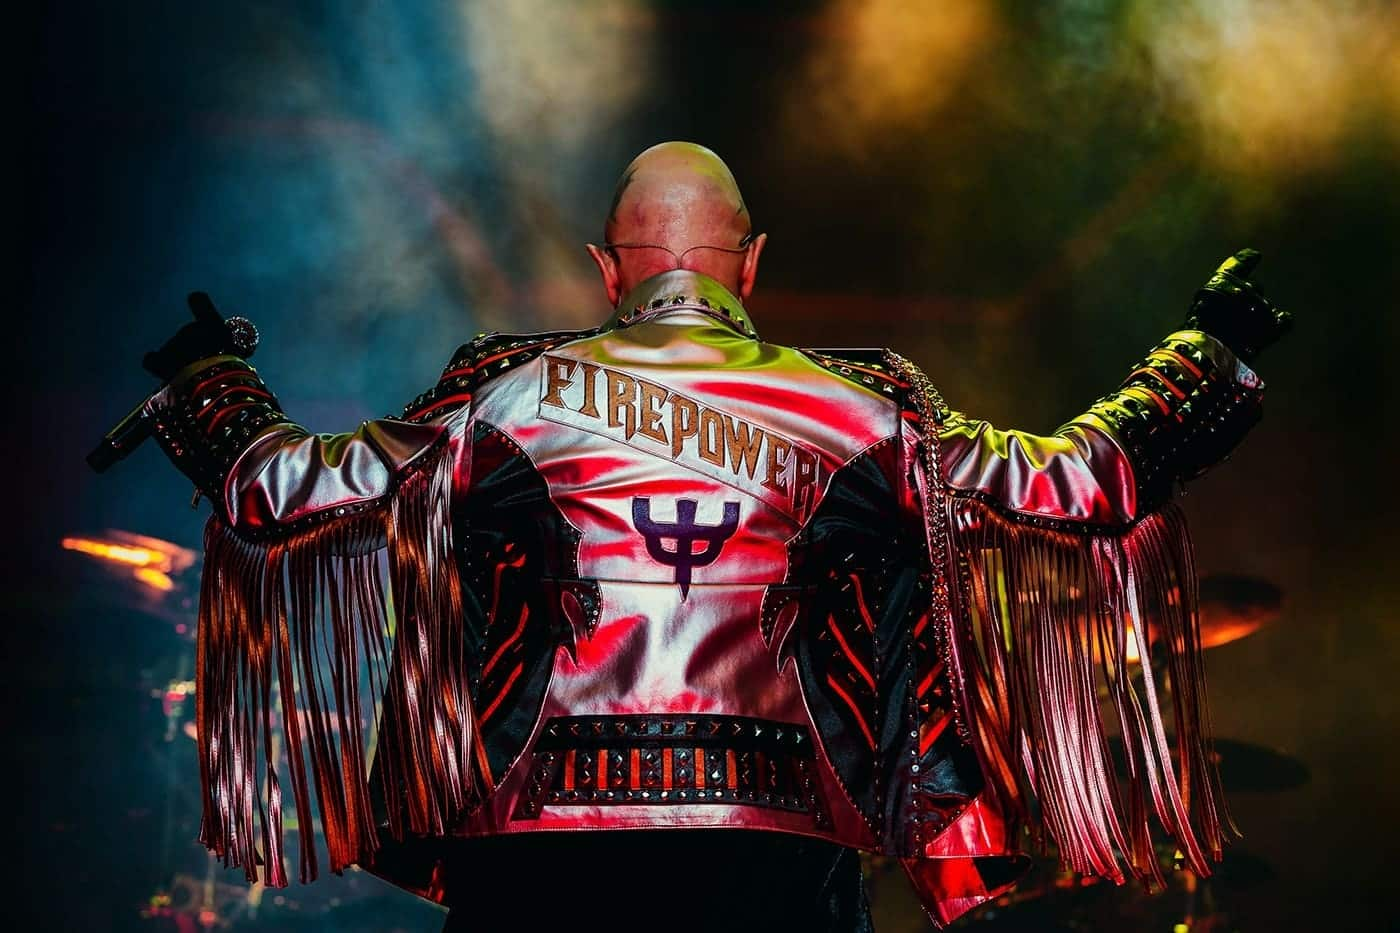 Judas Priest rob halford jacket